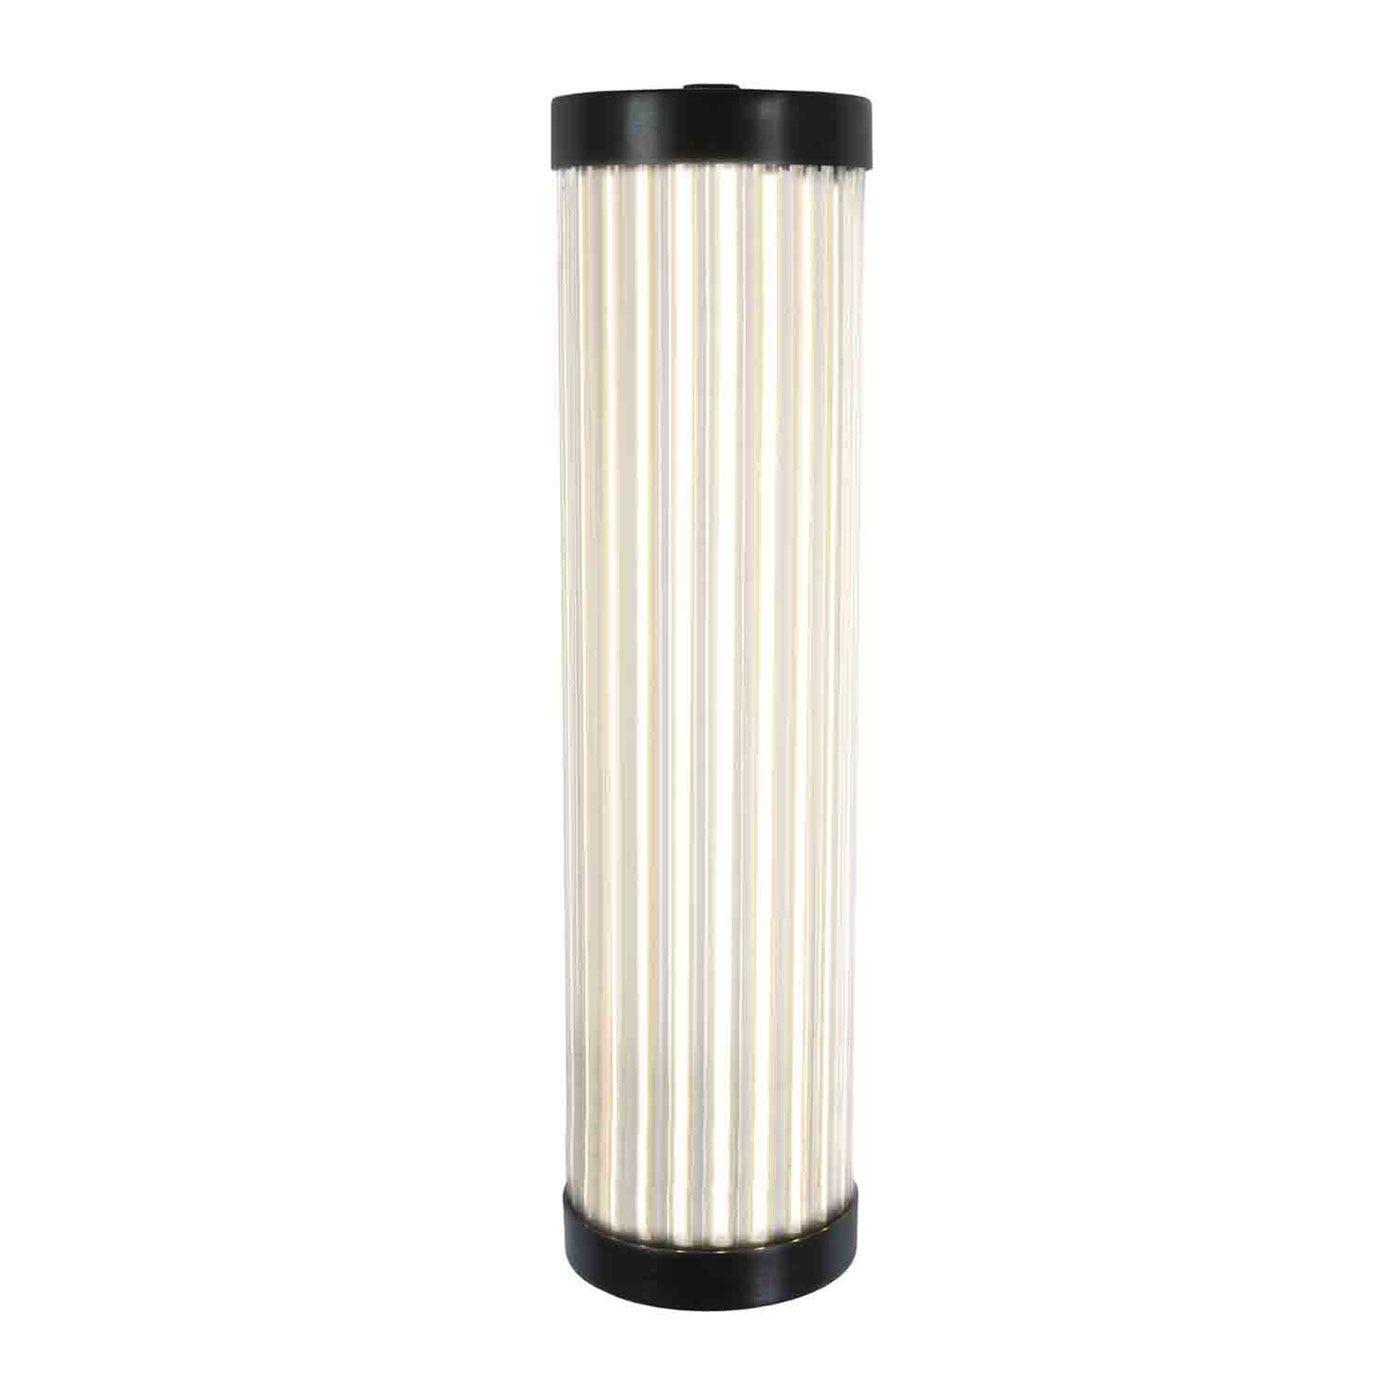 Pillar LED Wall Light